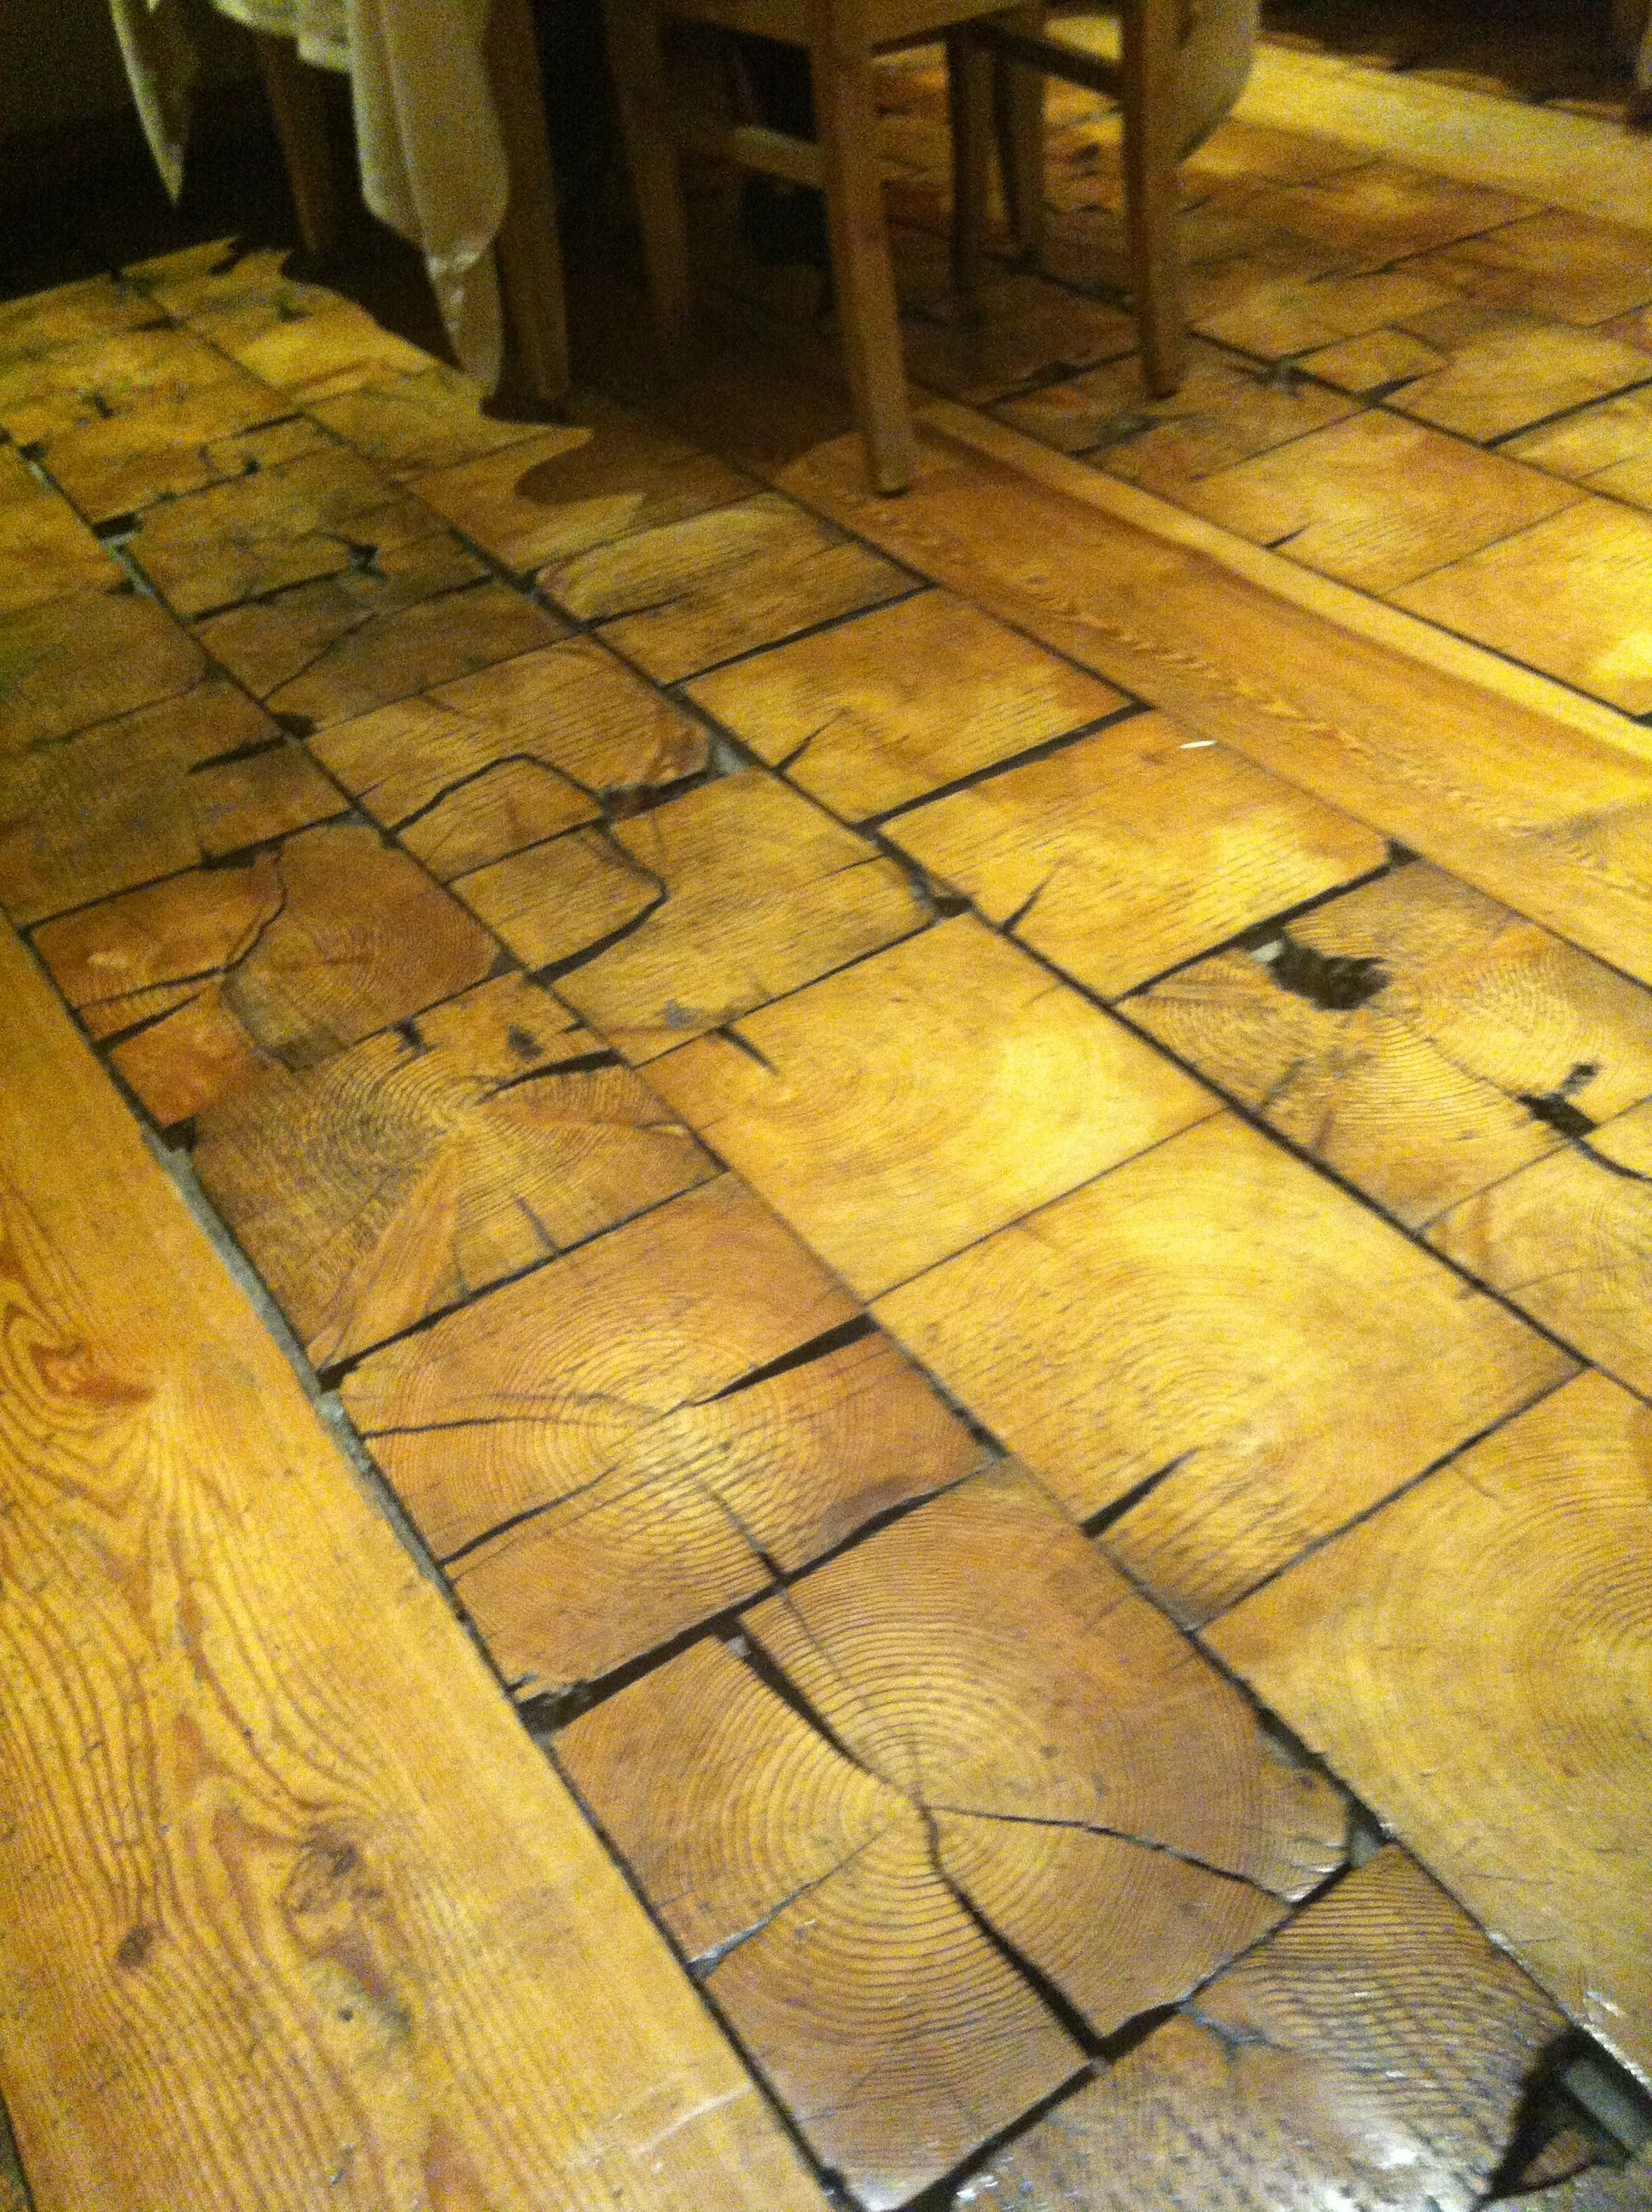 Natural Wood Floor Piso De Madera Pisos De Madera Rusticos Pisos De Madera